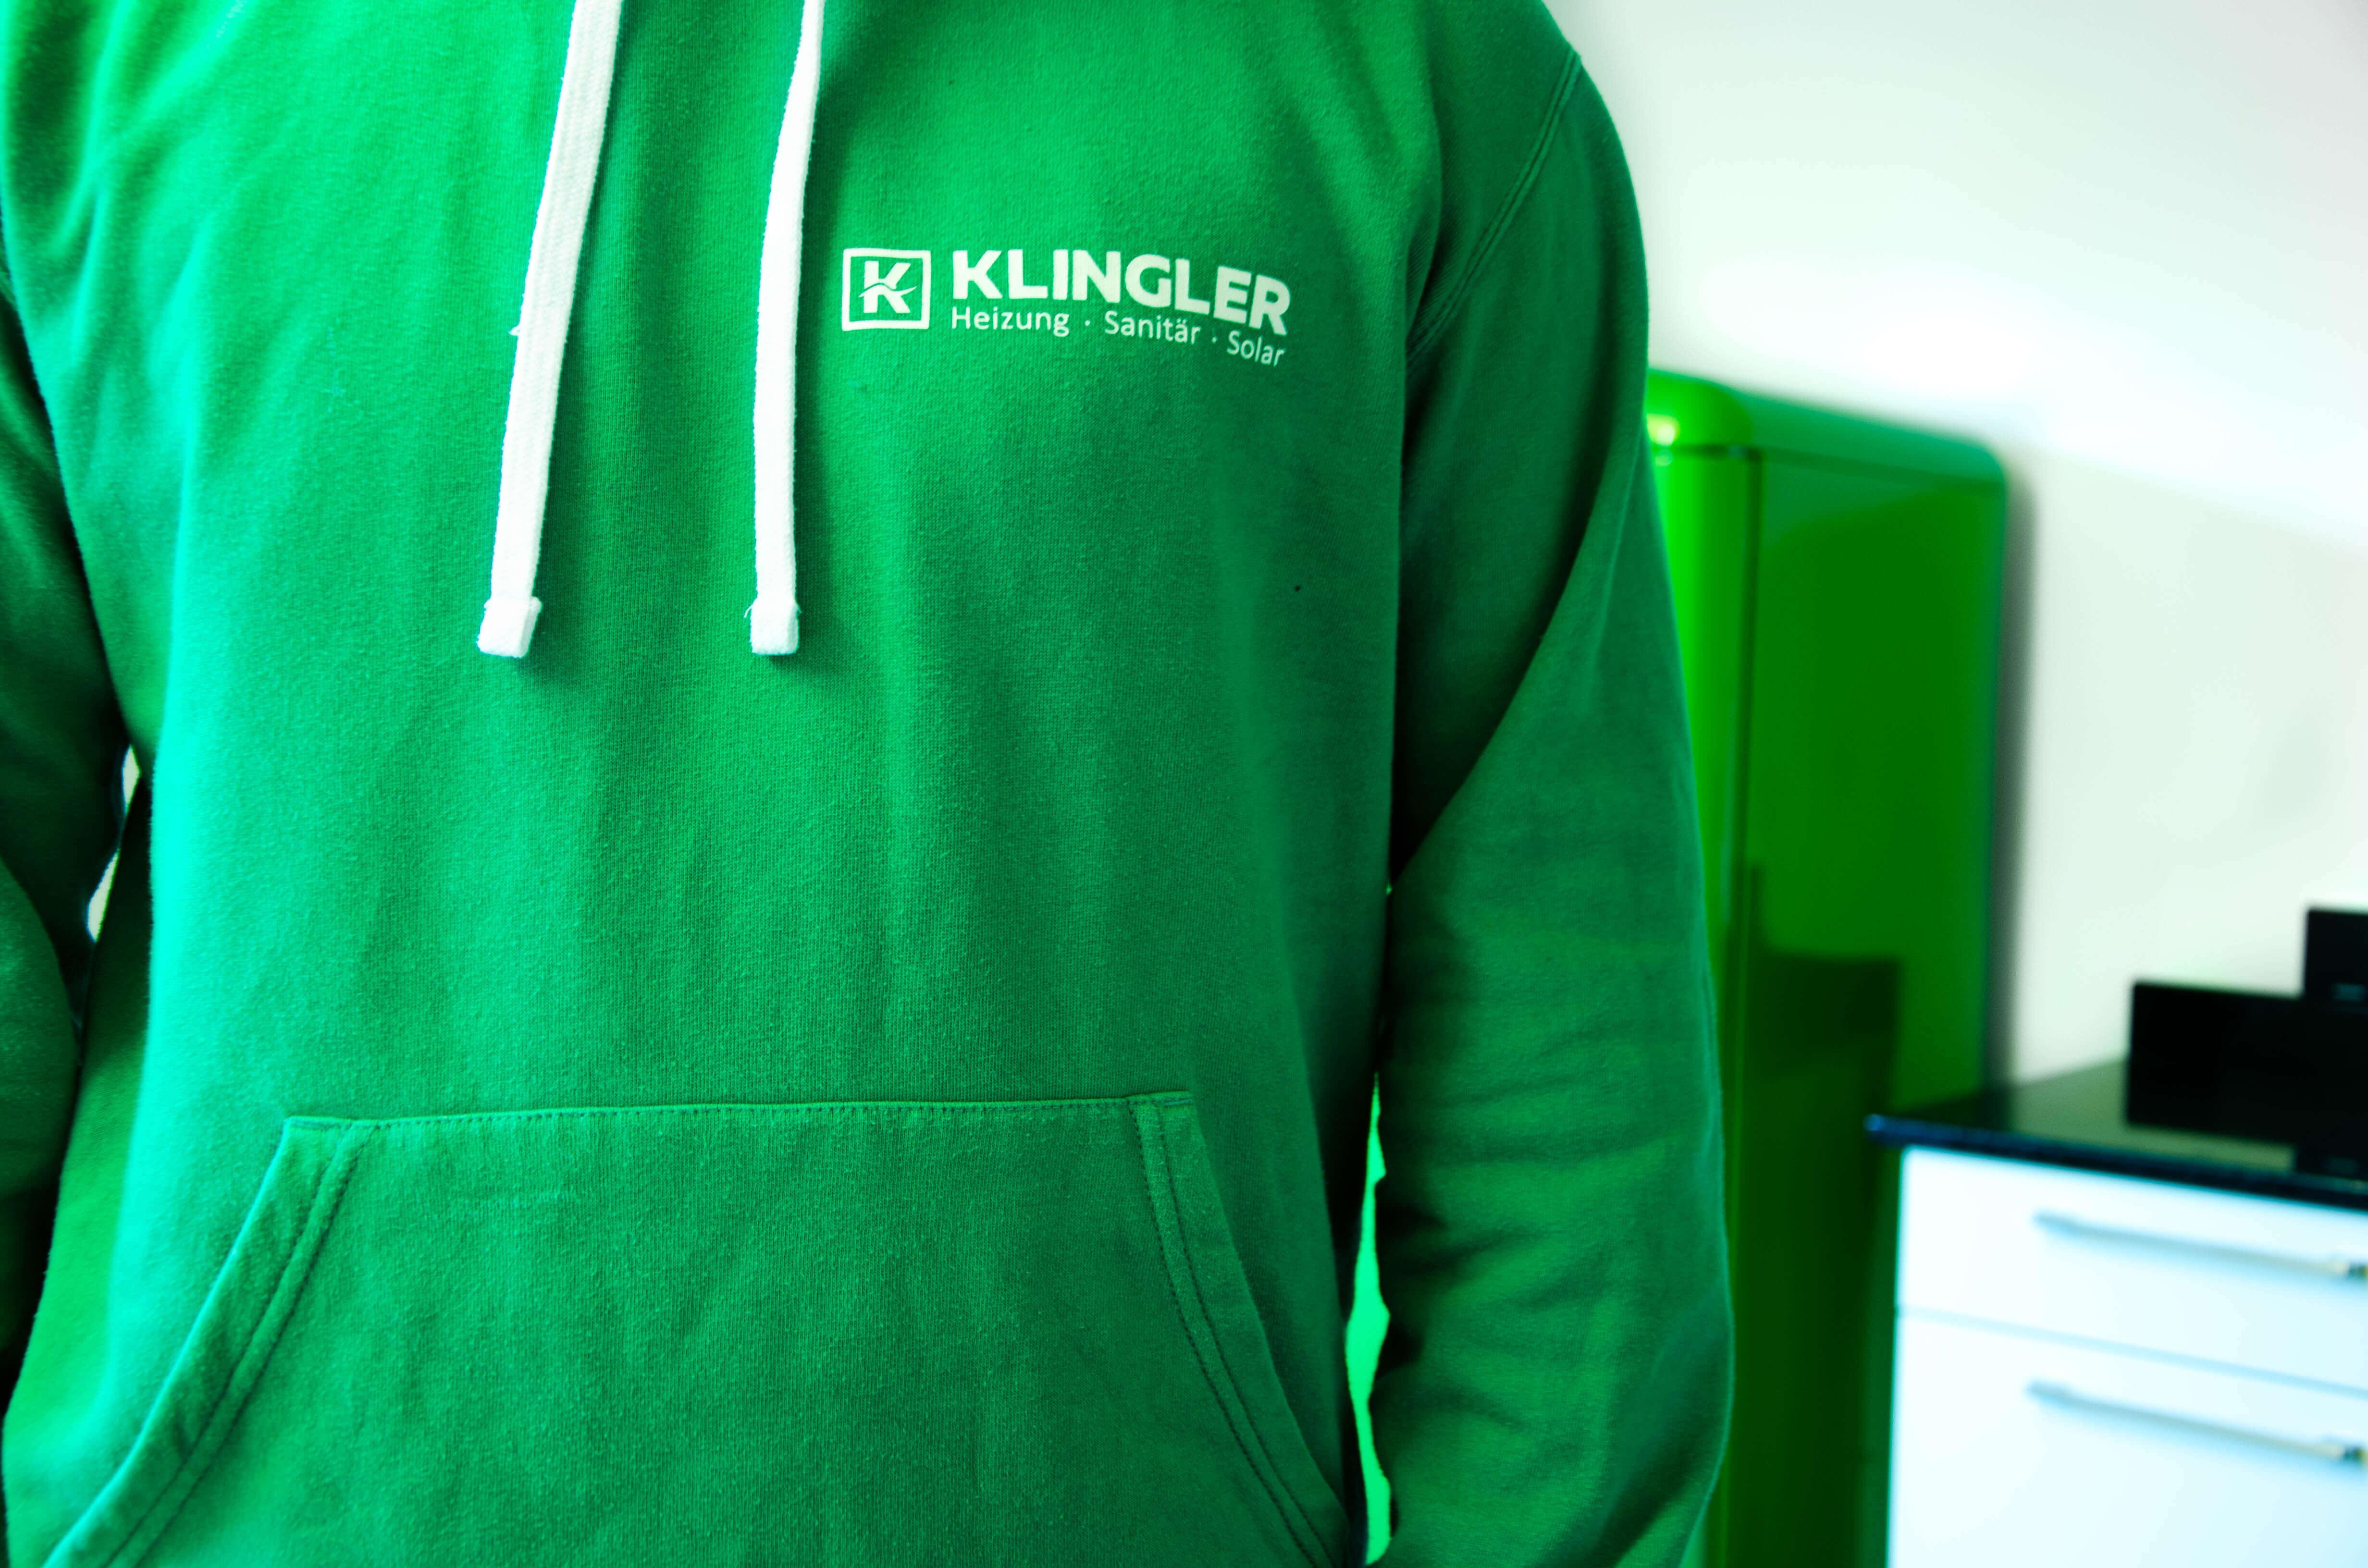 Klingler, Mitarbeiterbekleidung, Merchandise, Branding, Logo